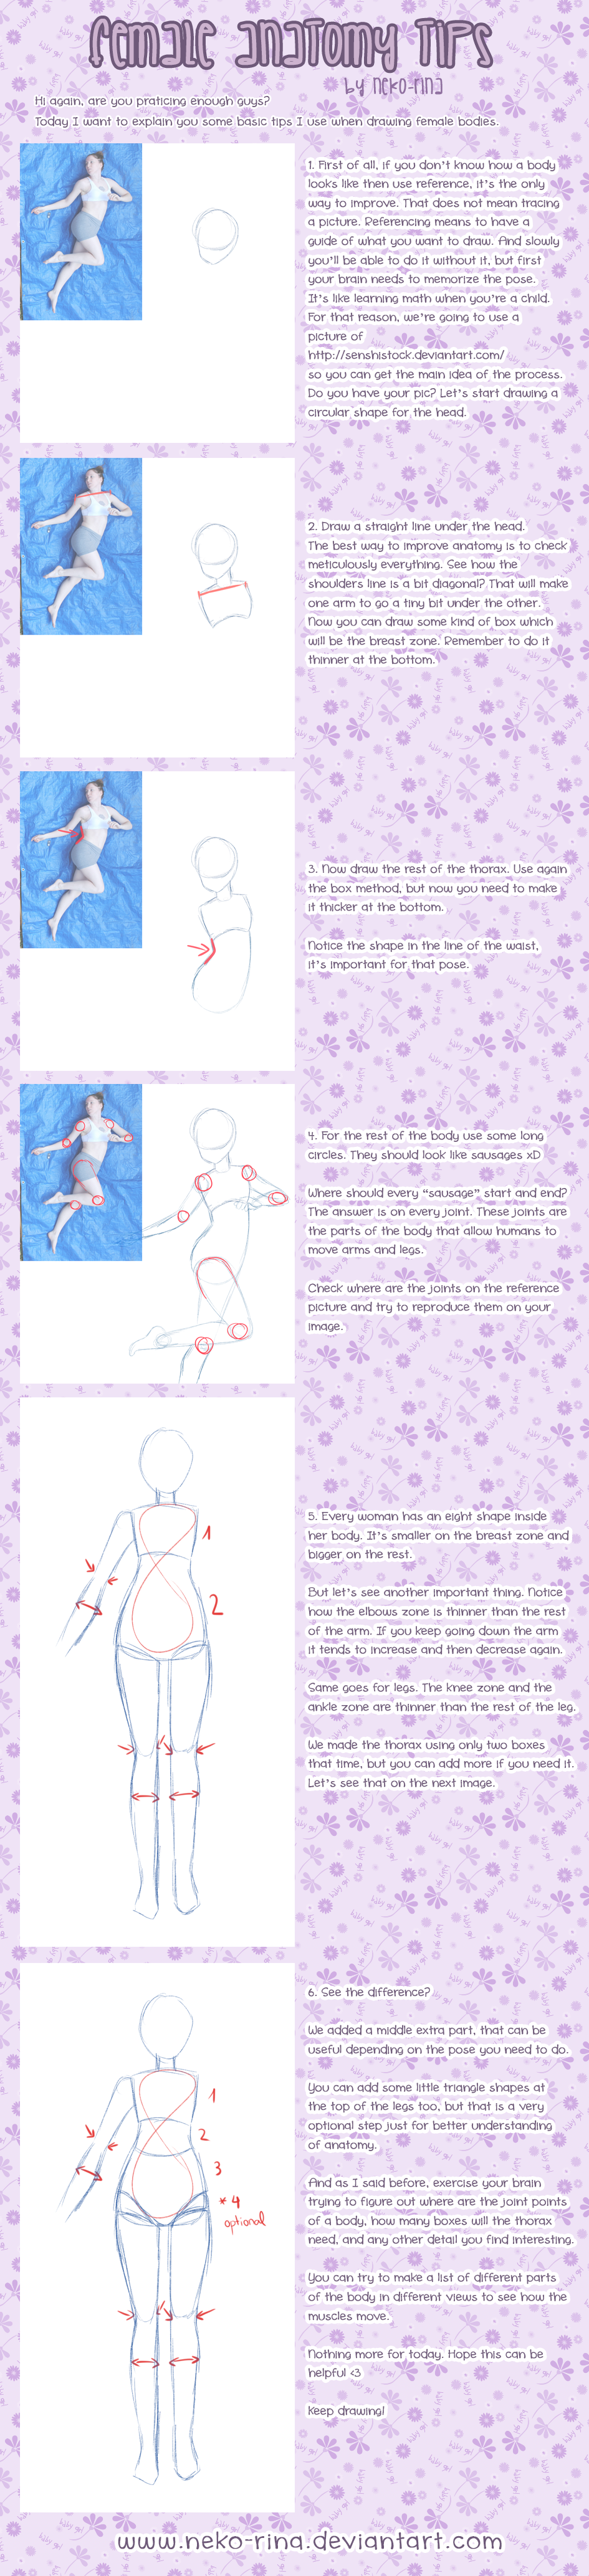 Female Anatomy Tips